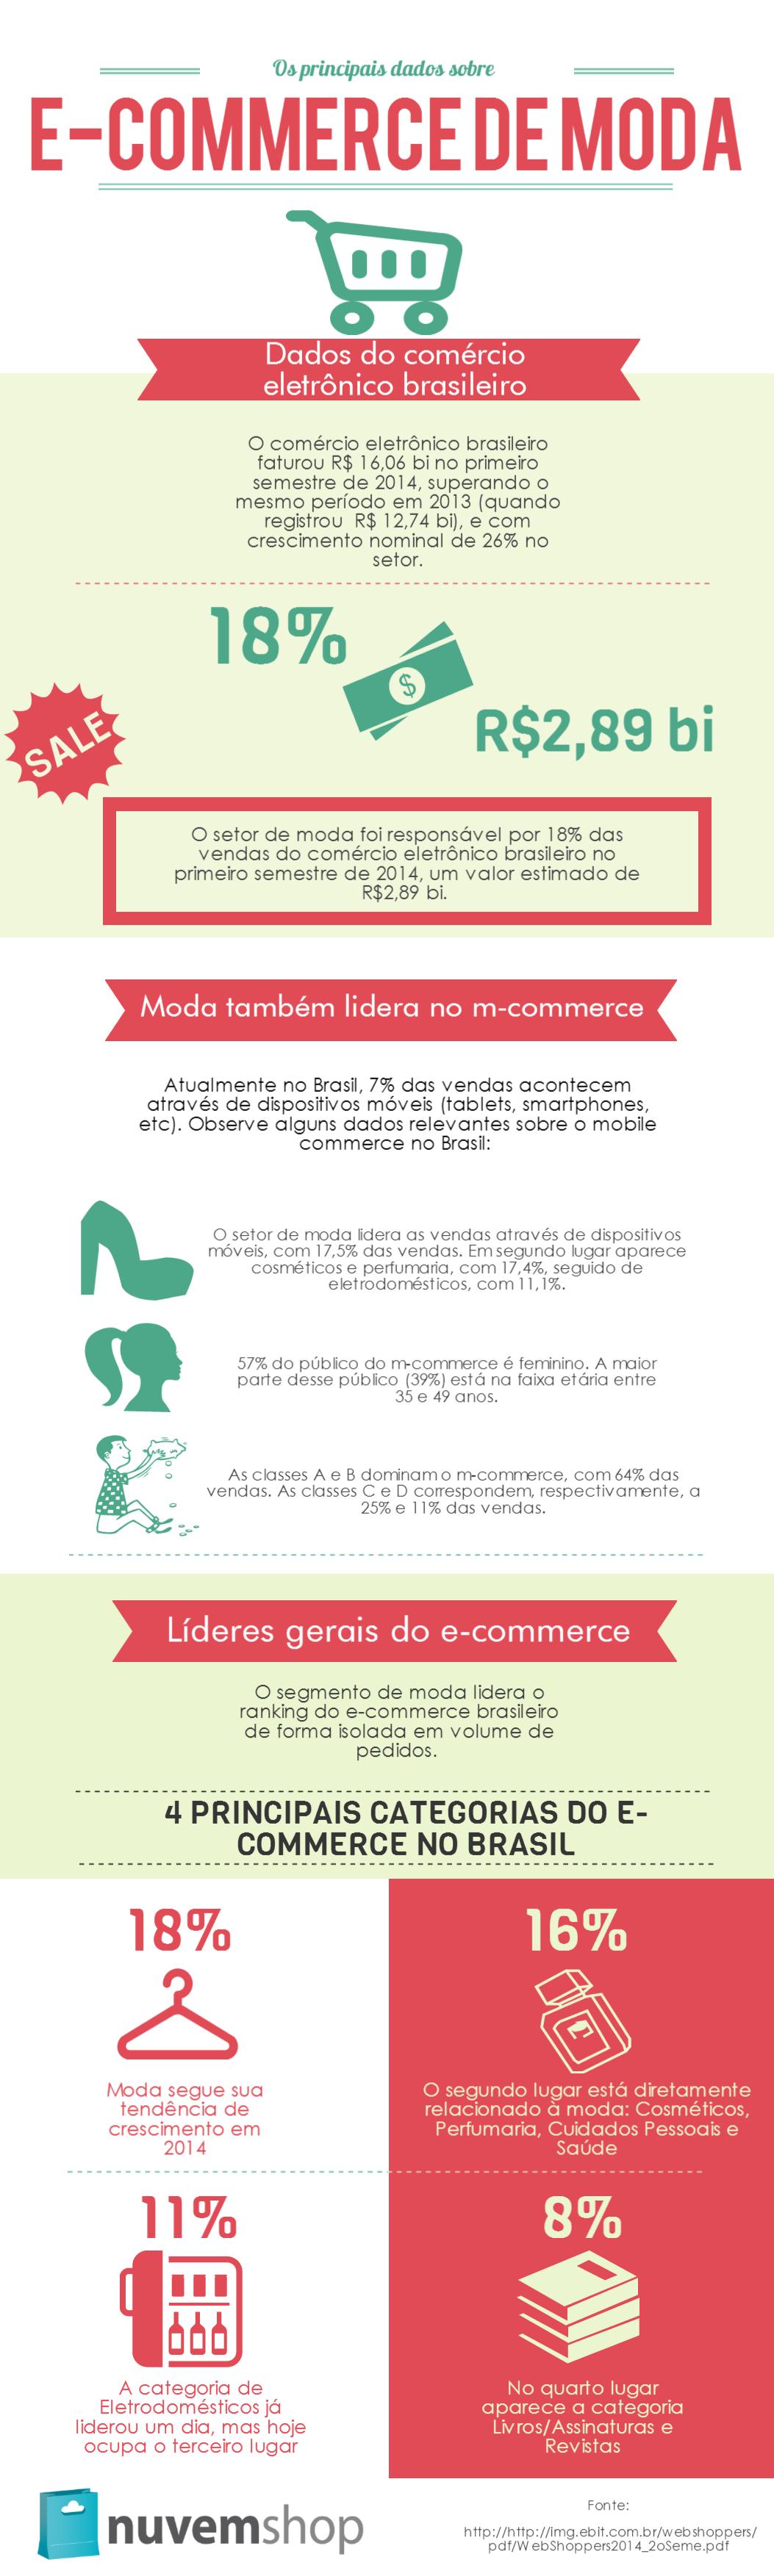 Dados e-commerce de moda no Brasil